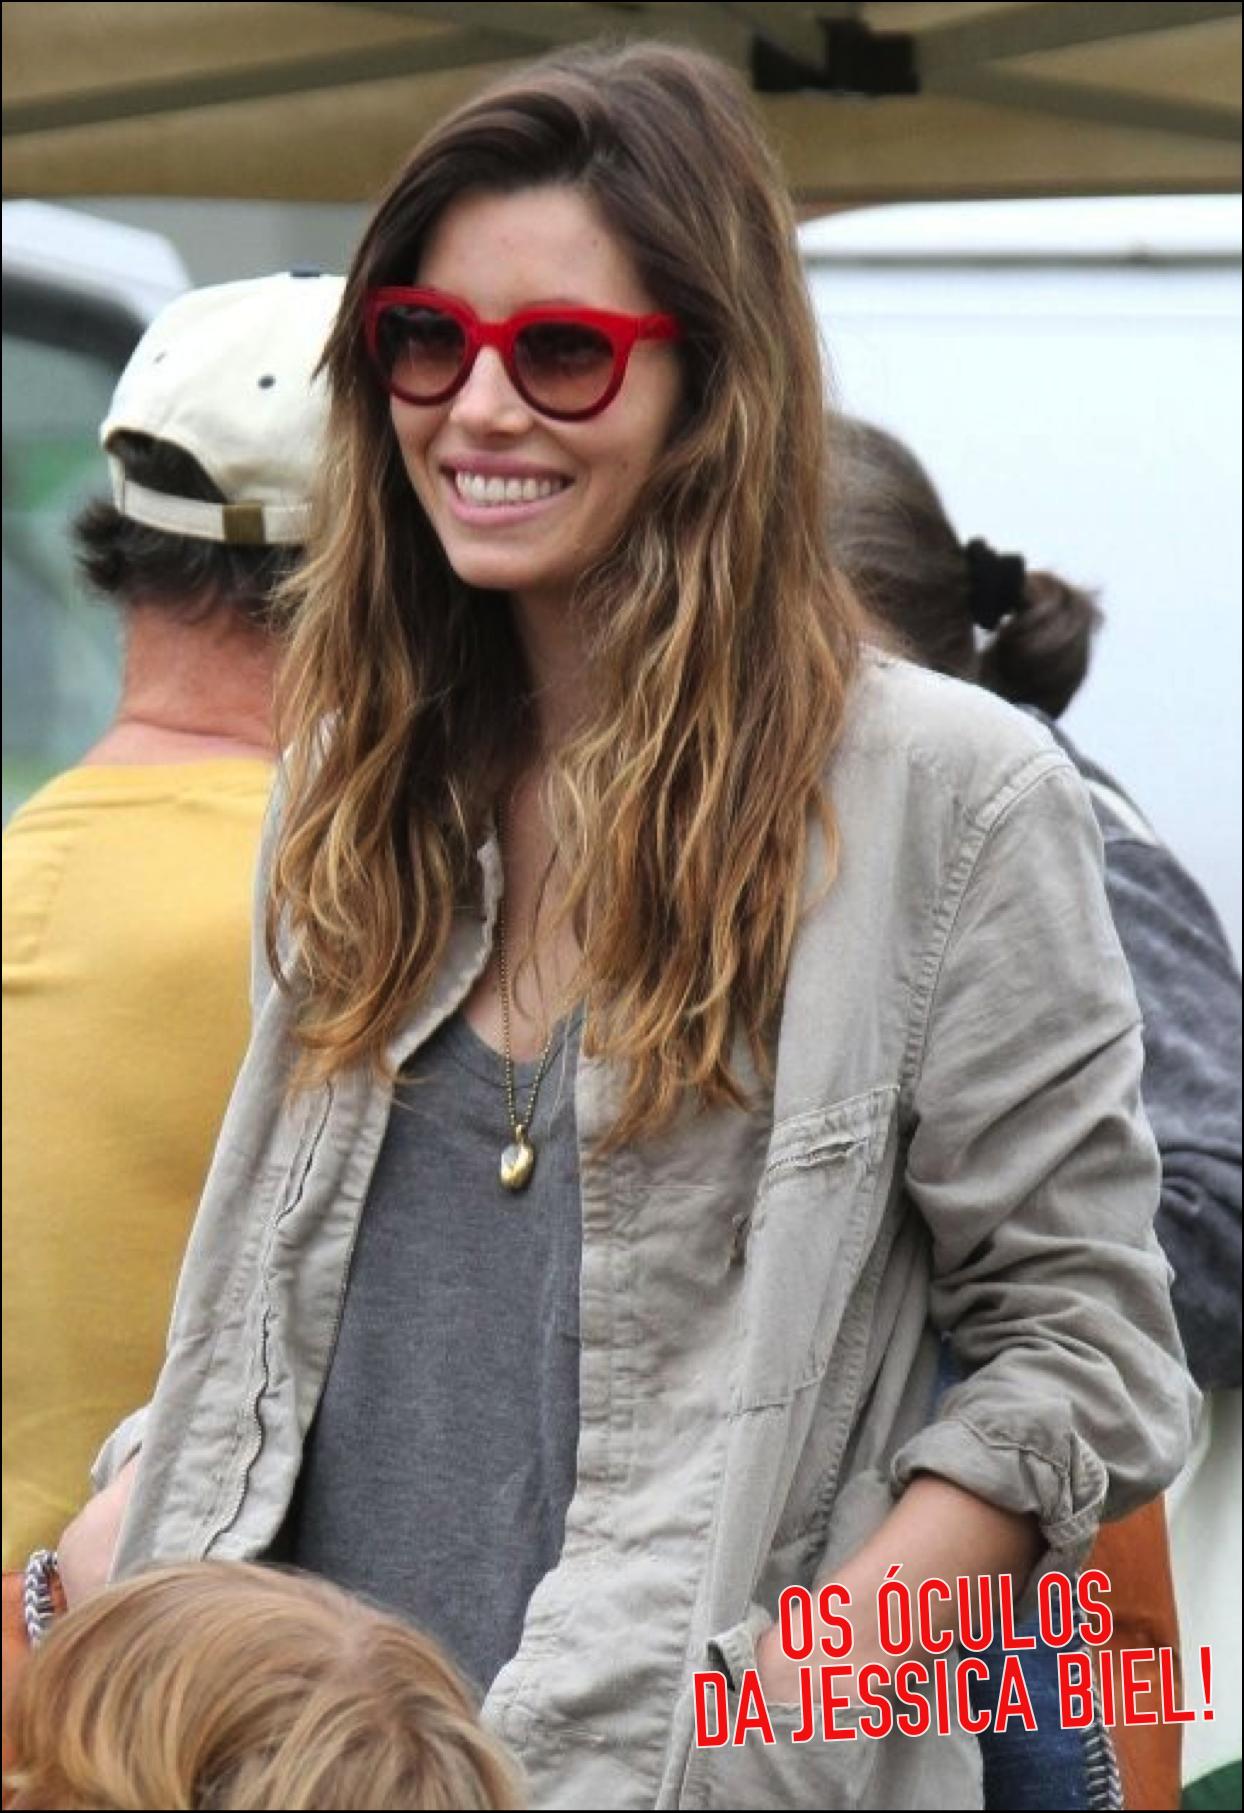 biel red sunglasses